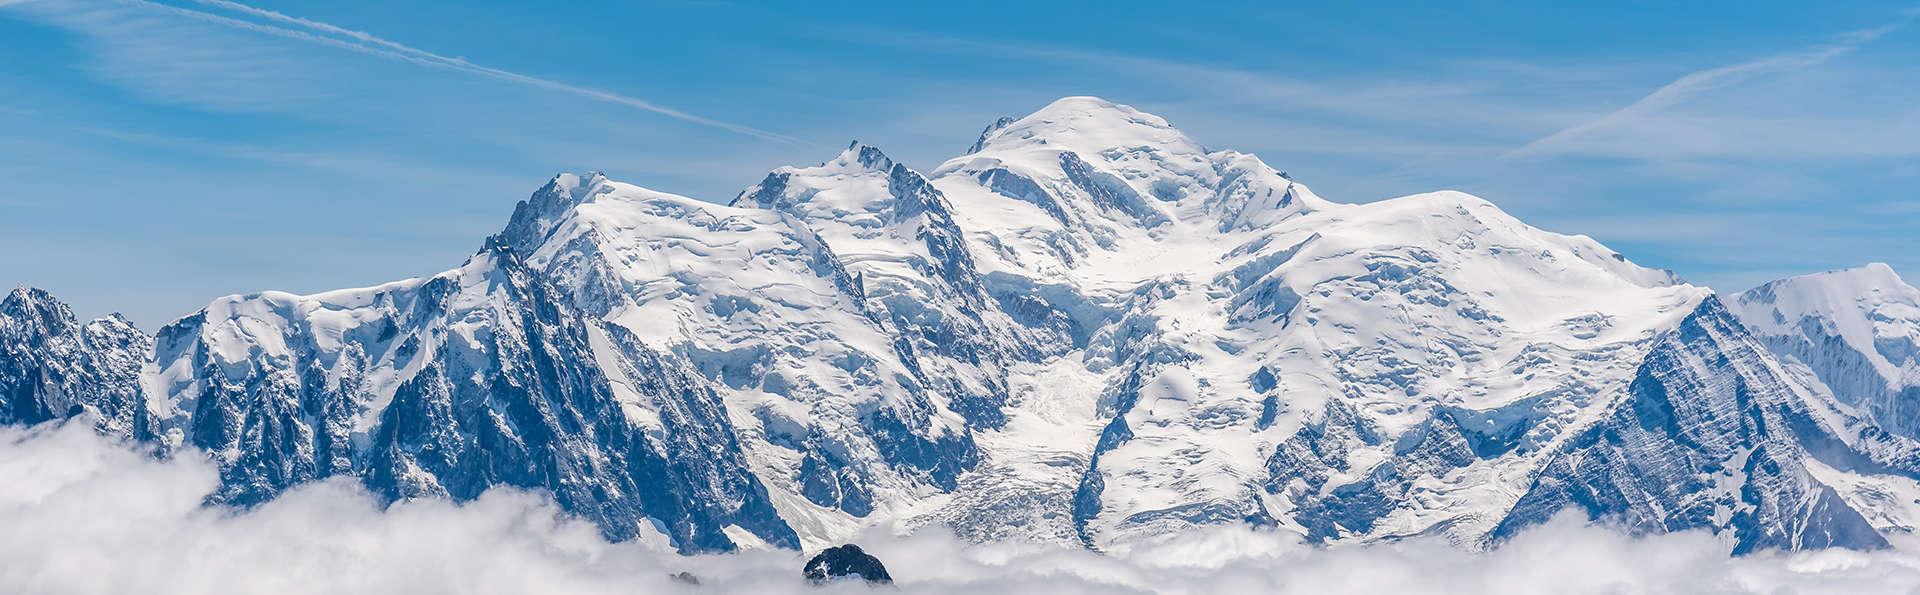 Alpina Eclectic Hotel Chamonix  - Edit_Destination2.jpg